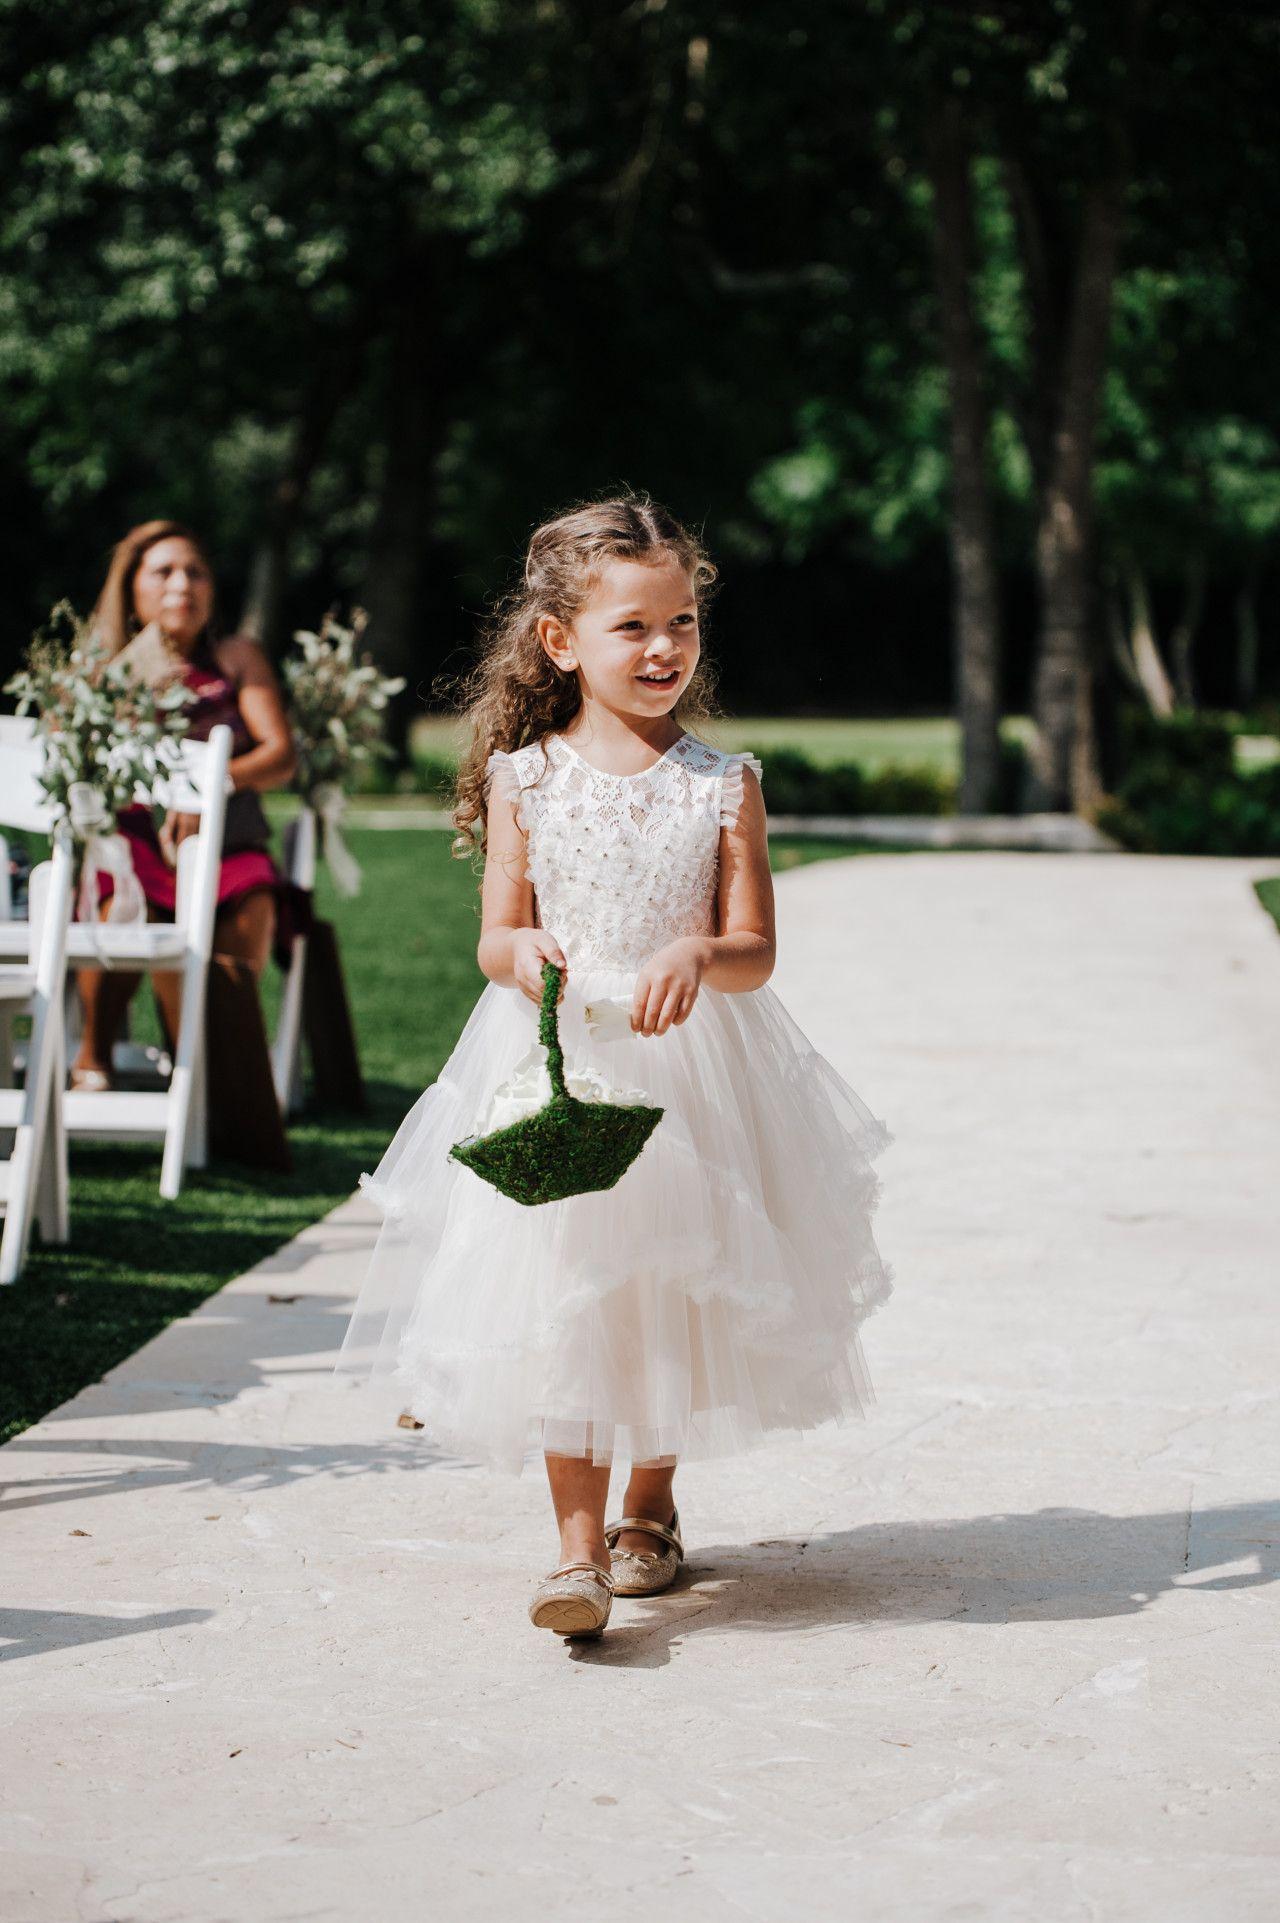 Stonecreek Hall Outdoor Wedding Inspiration Wedding Inspiration